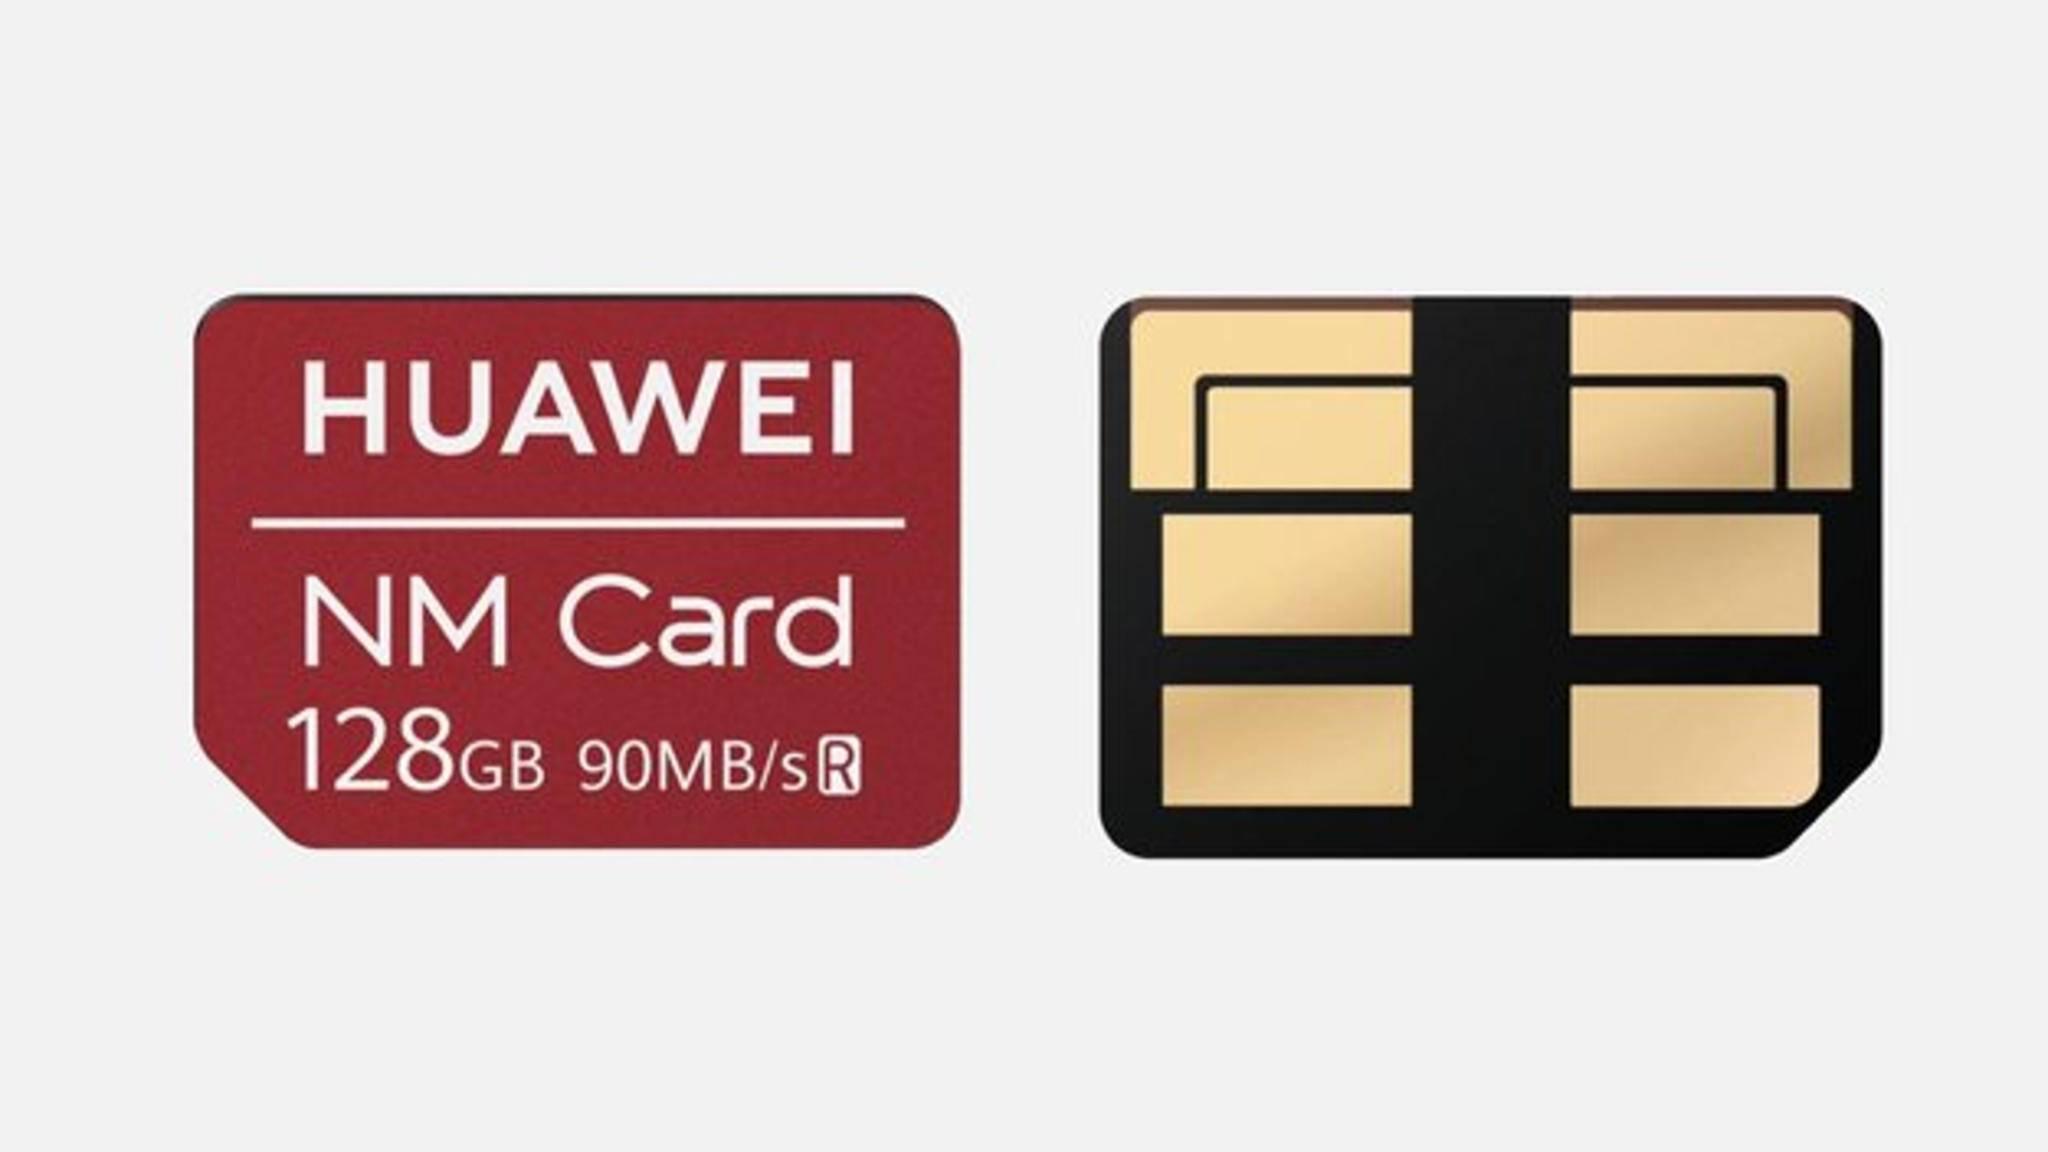 huawei sd karte Nano SD Karte: Das steckt hinter der neuen Memory Card von Huawei